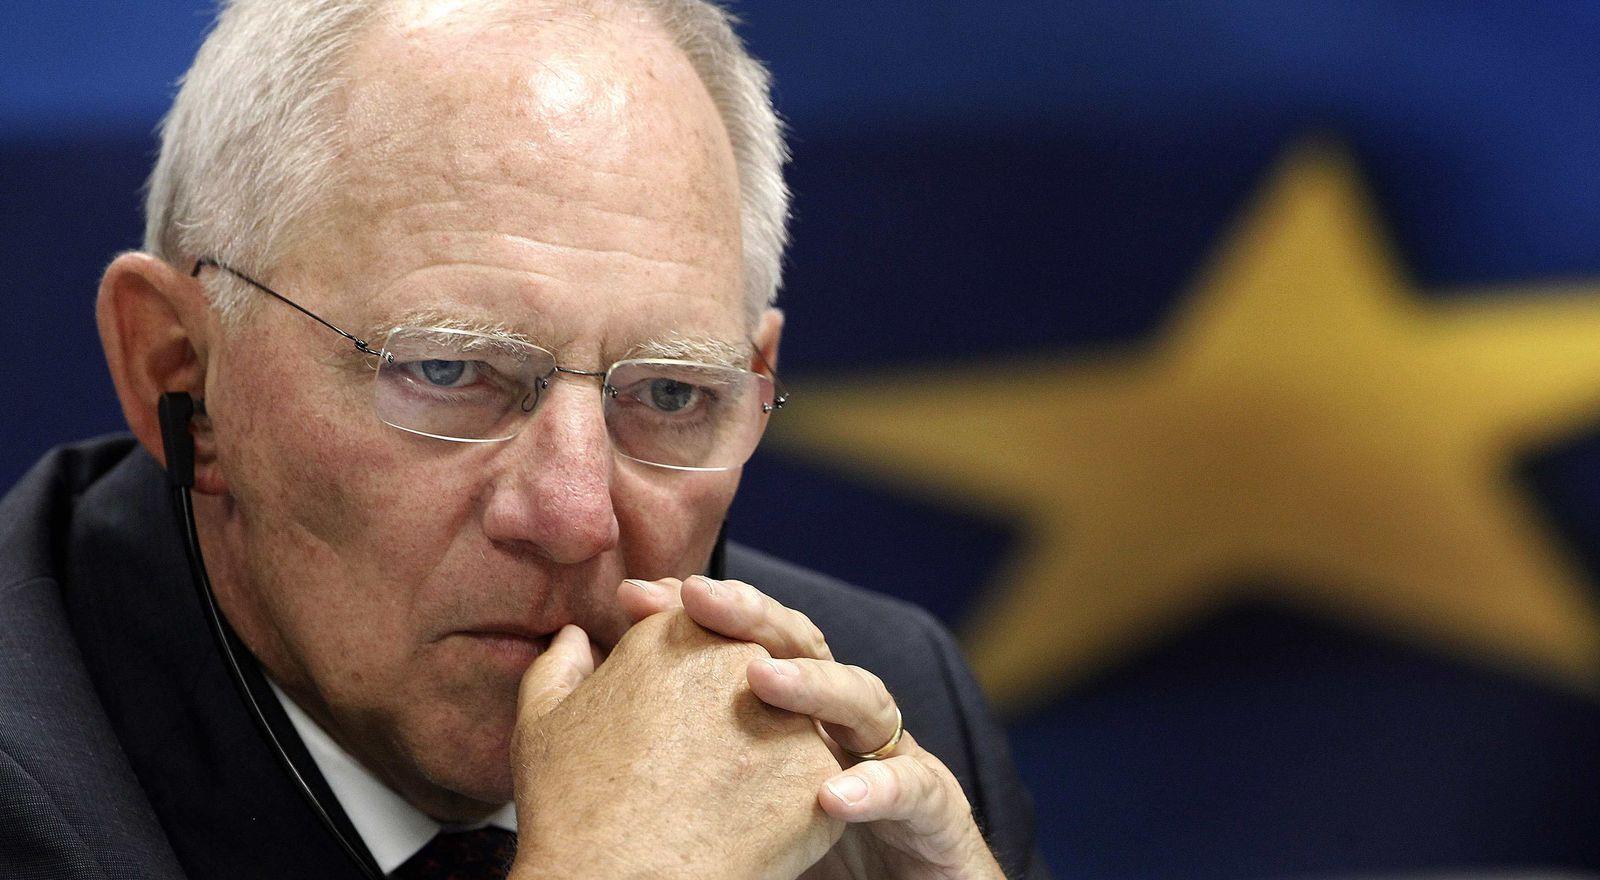 Wolfgang Schäuble / Griechenland-Hilfe